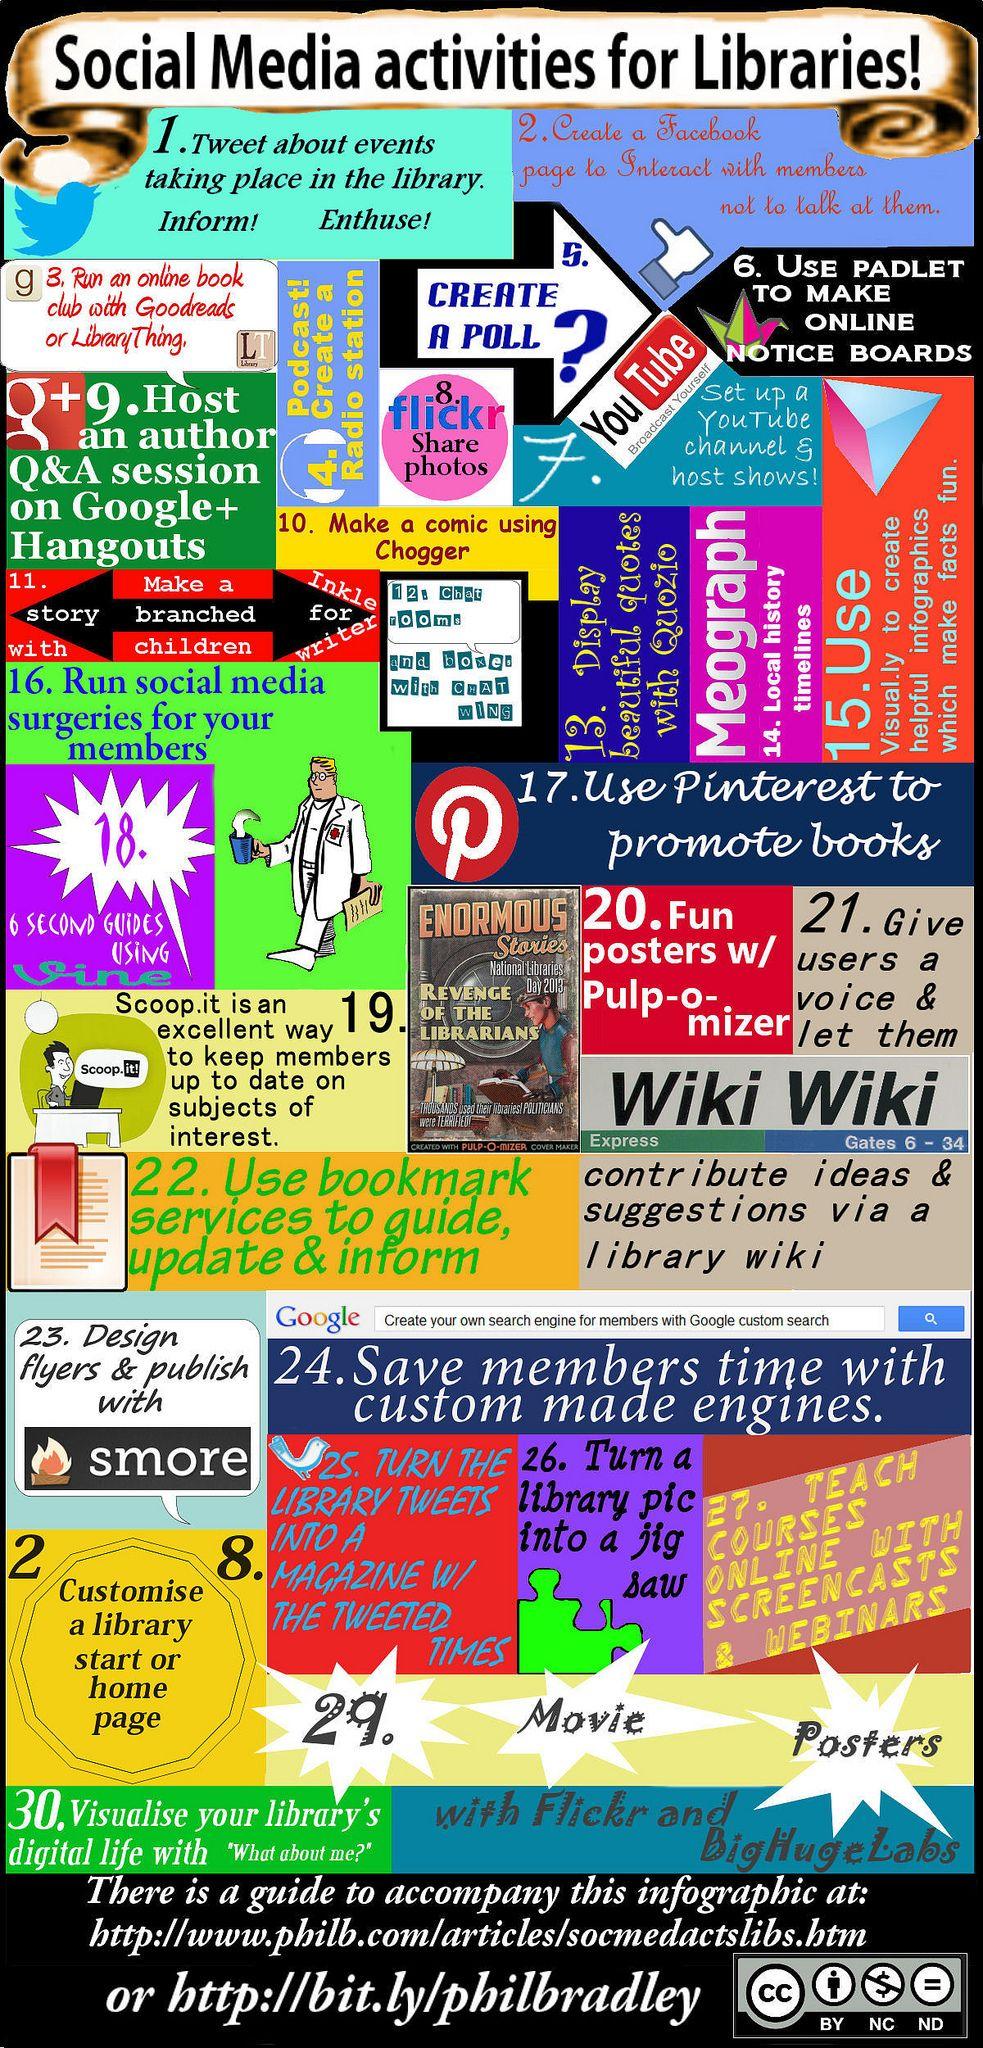 Social media activities for libraries Flickr